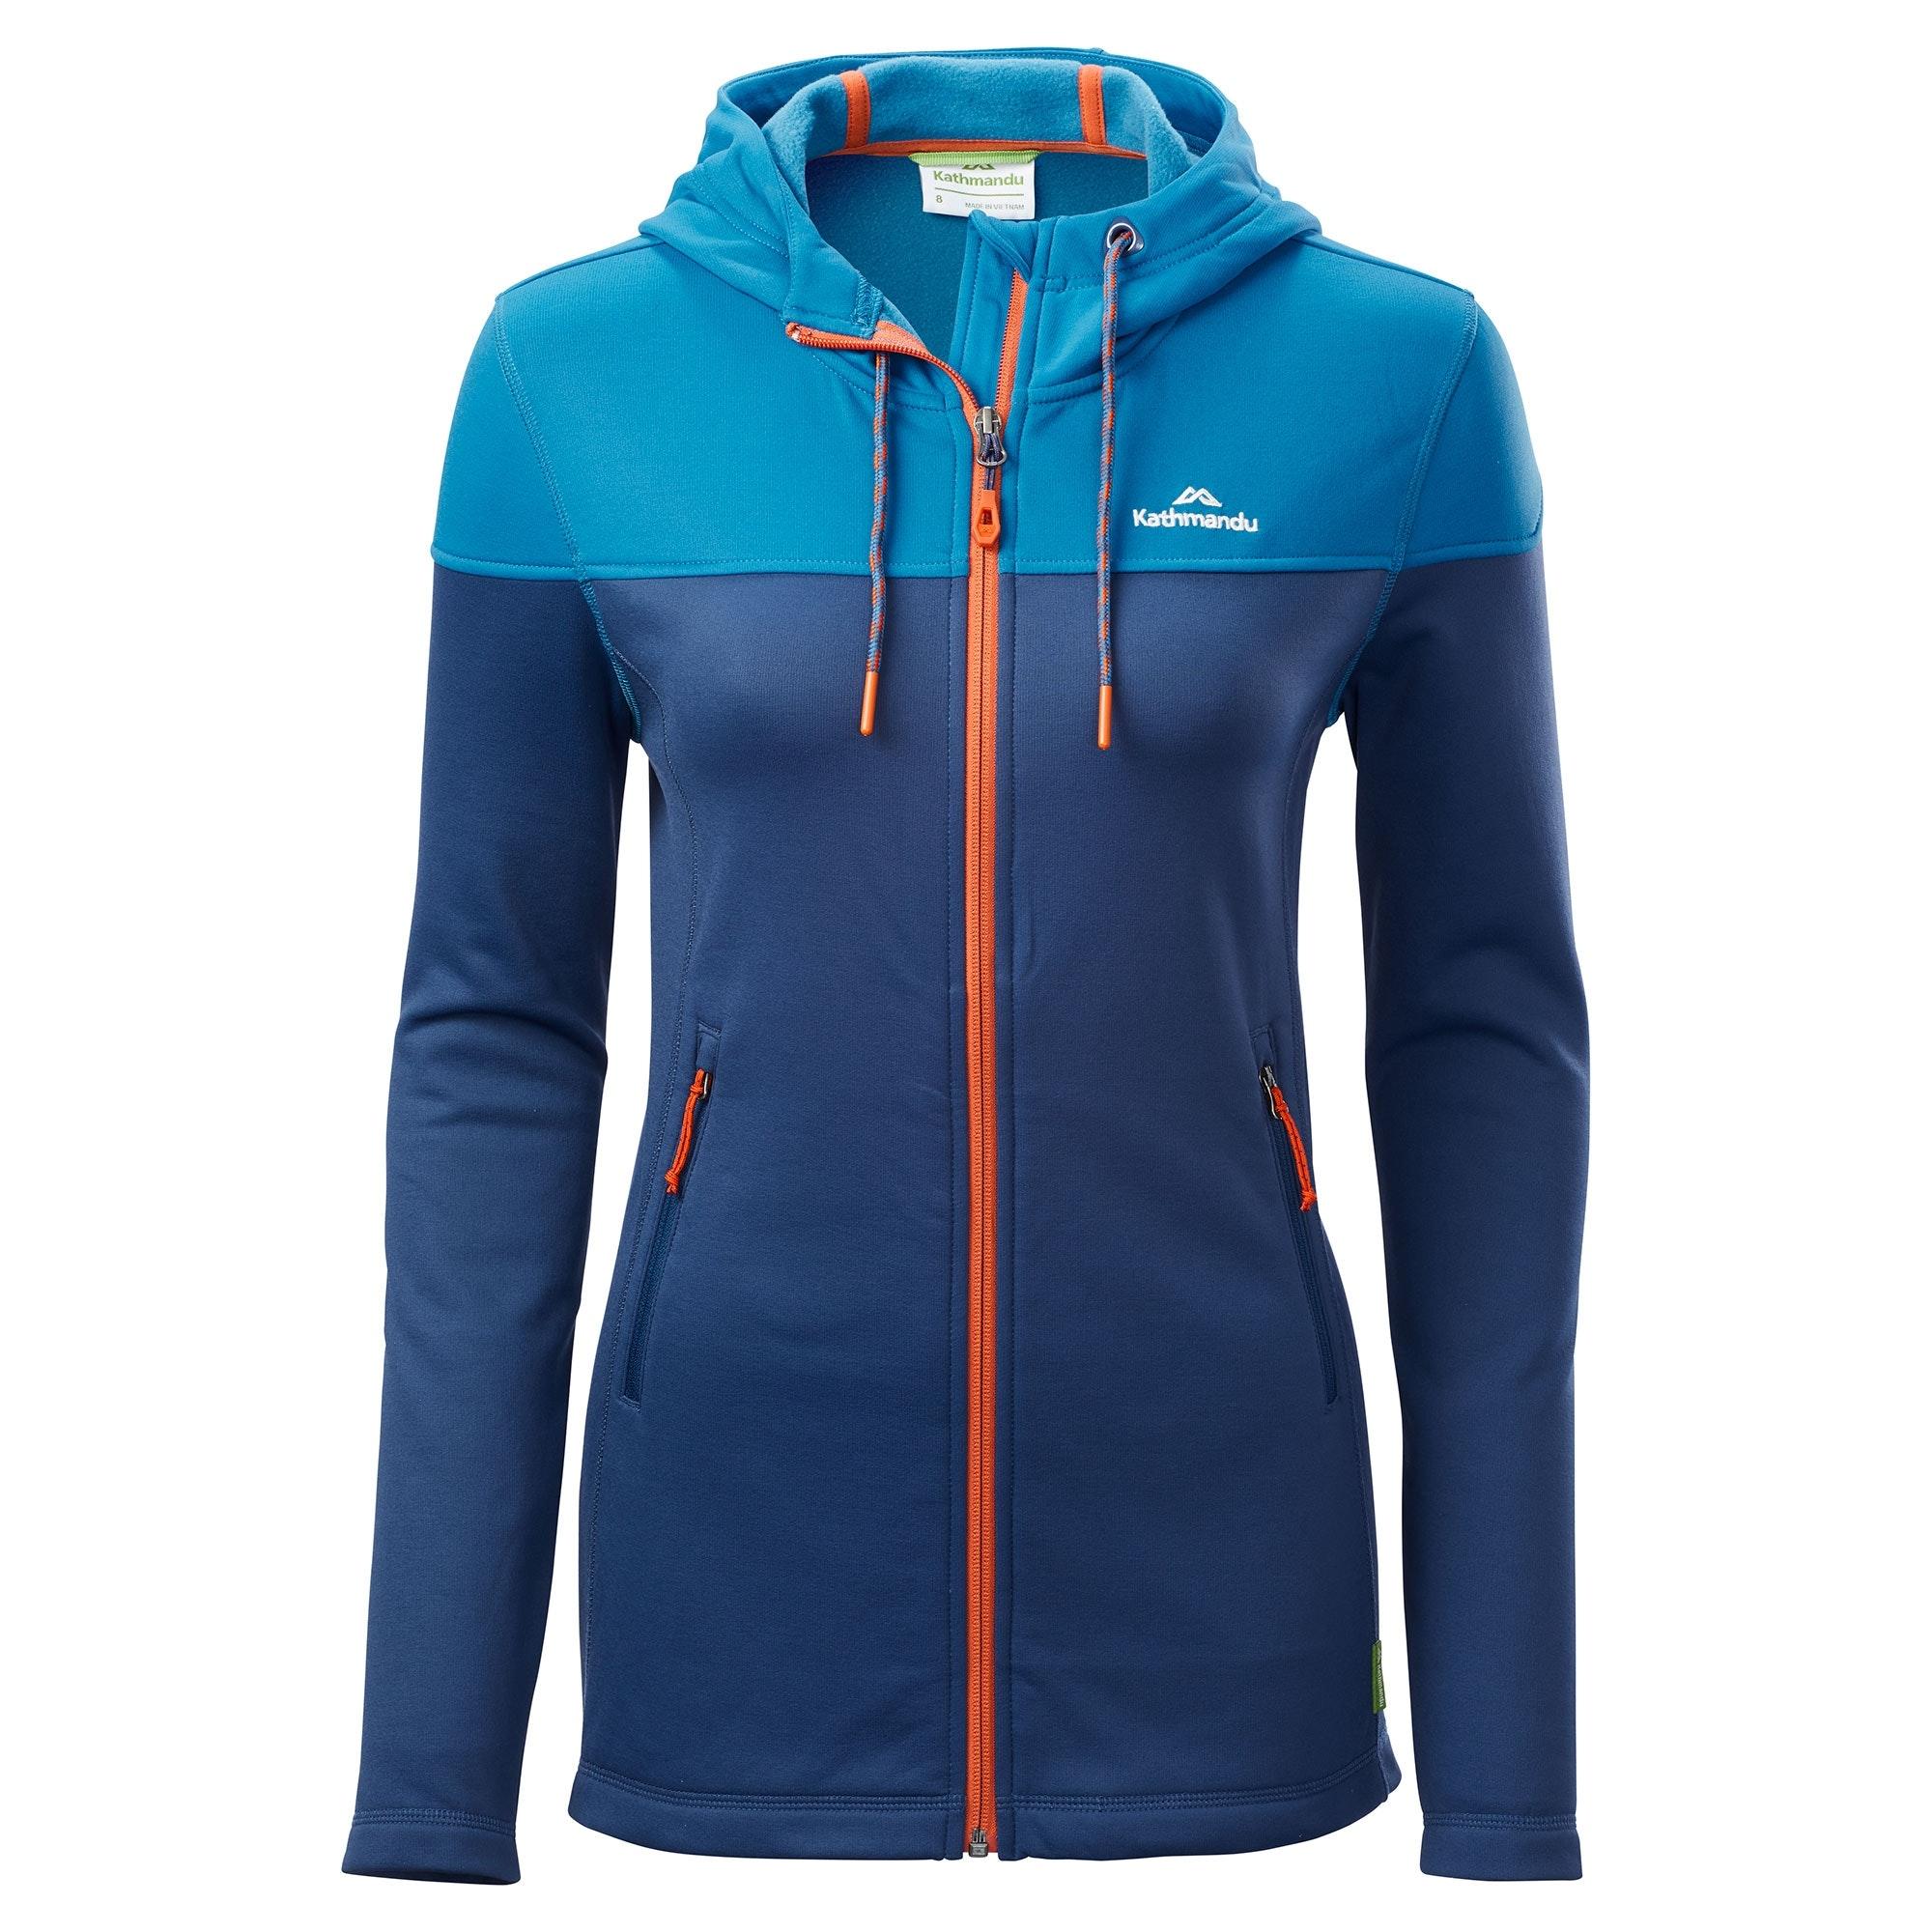 NEW-Kathmandu-Tarras-Womens-Full-Zip-Warm-Hooded-Outdoor-Walking-Jacket-Top